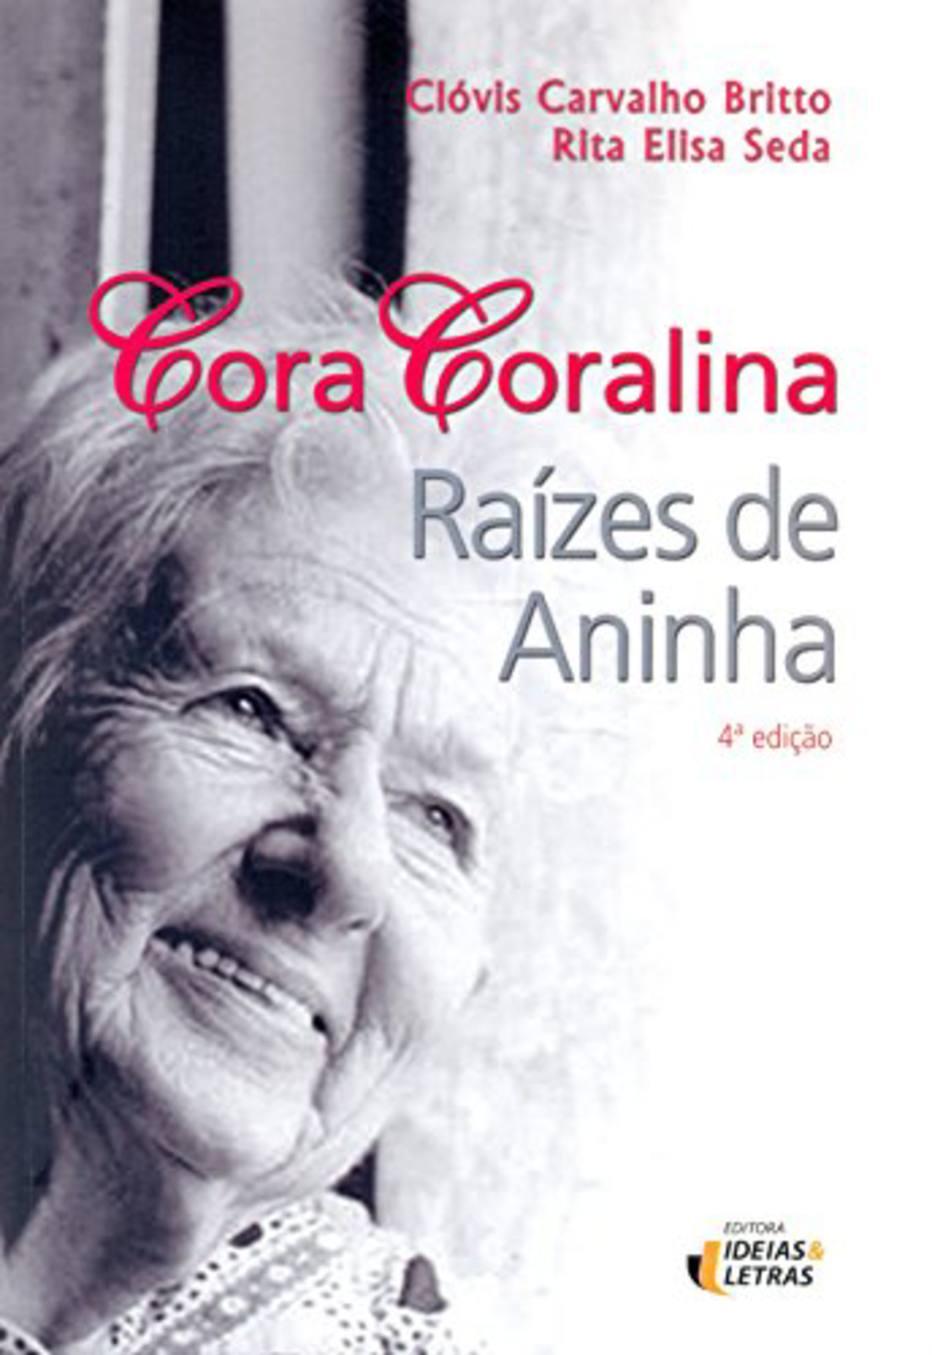 Cora 1